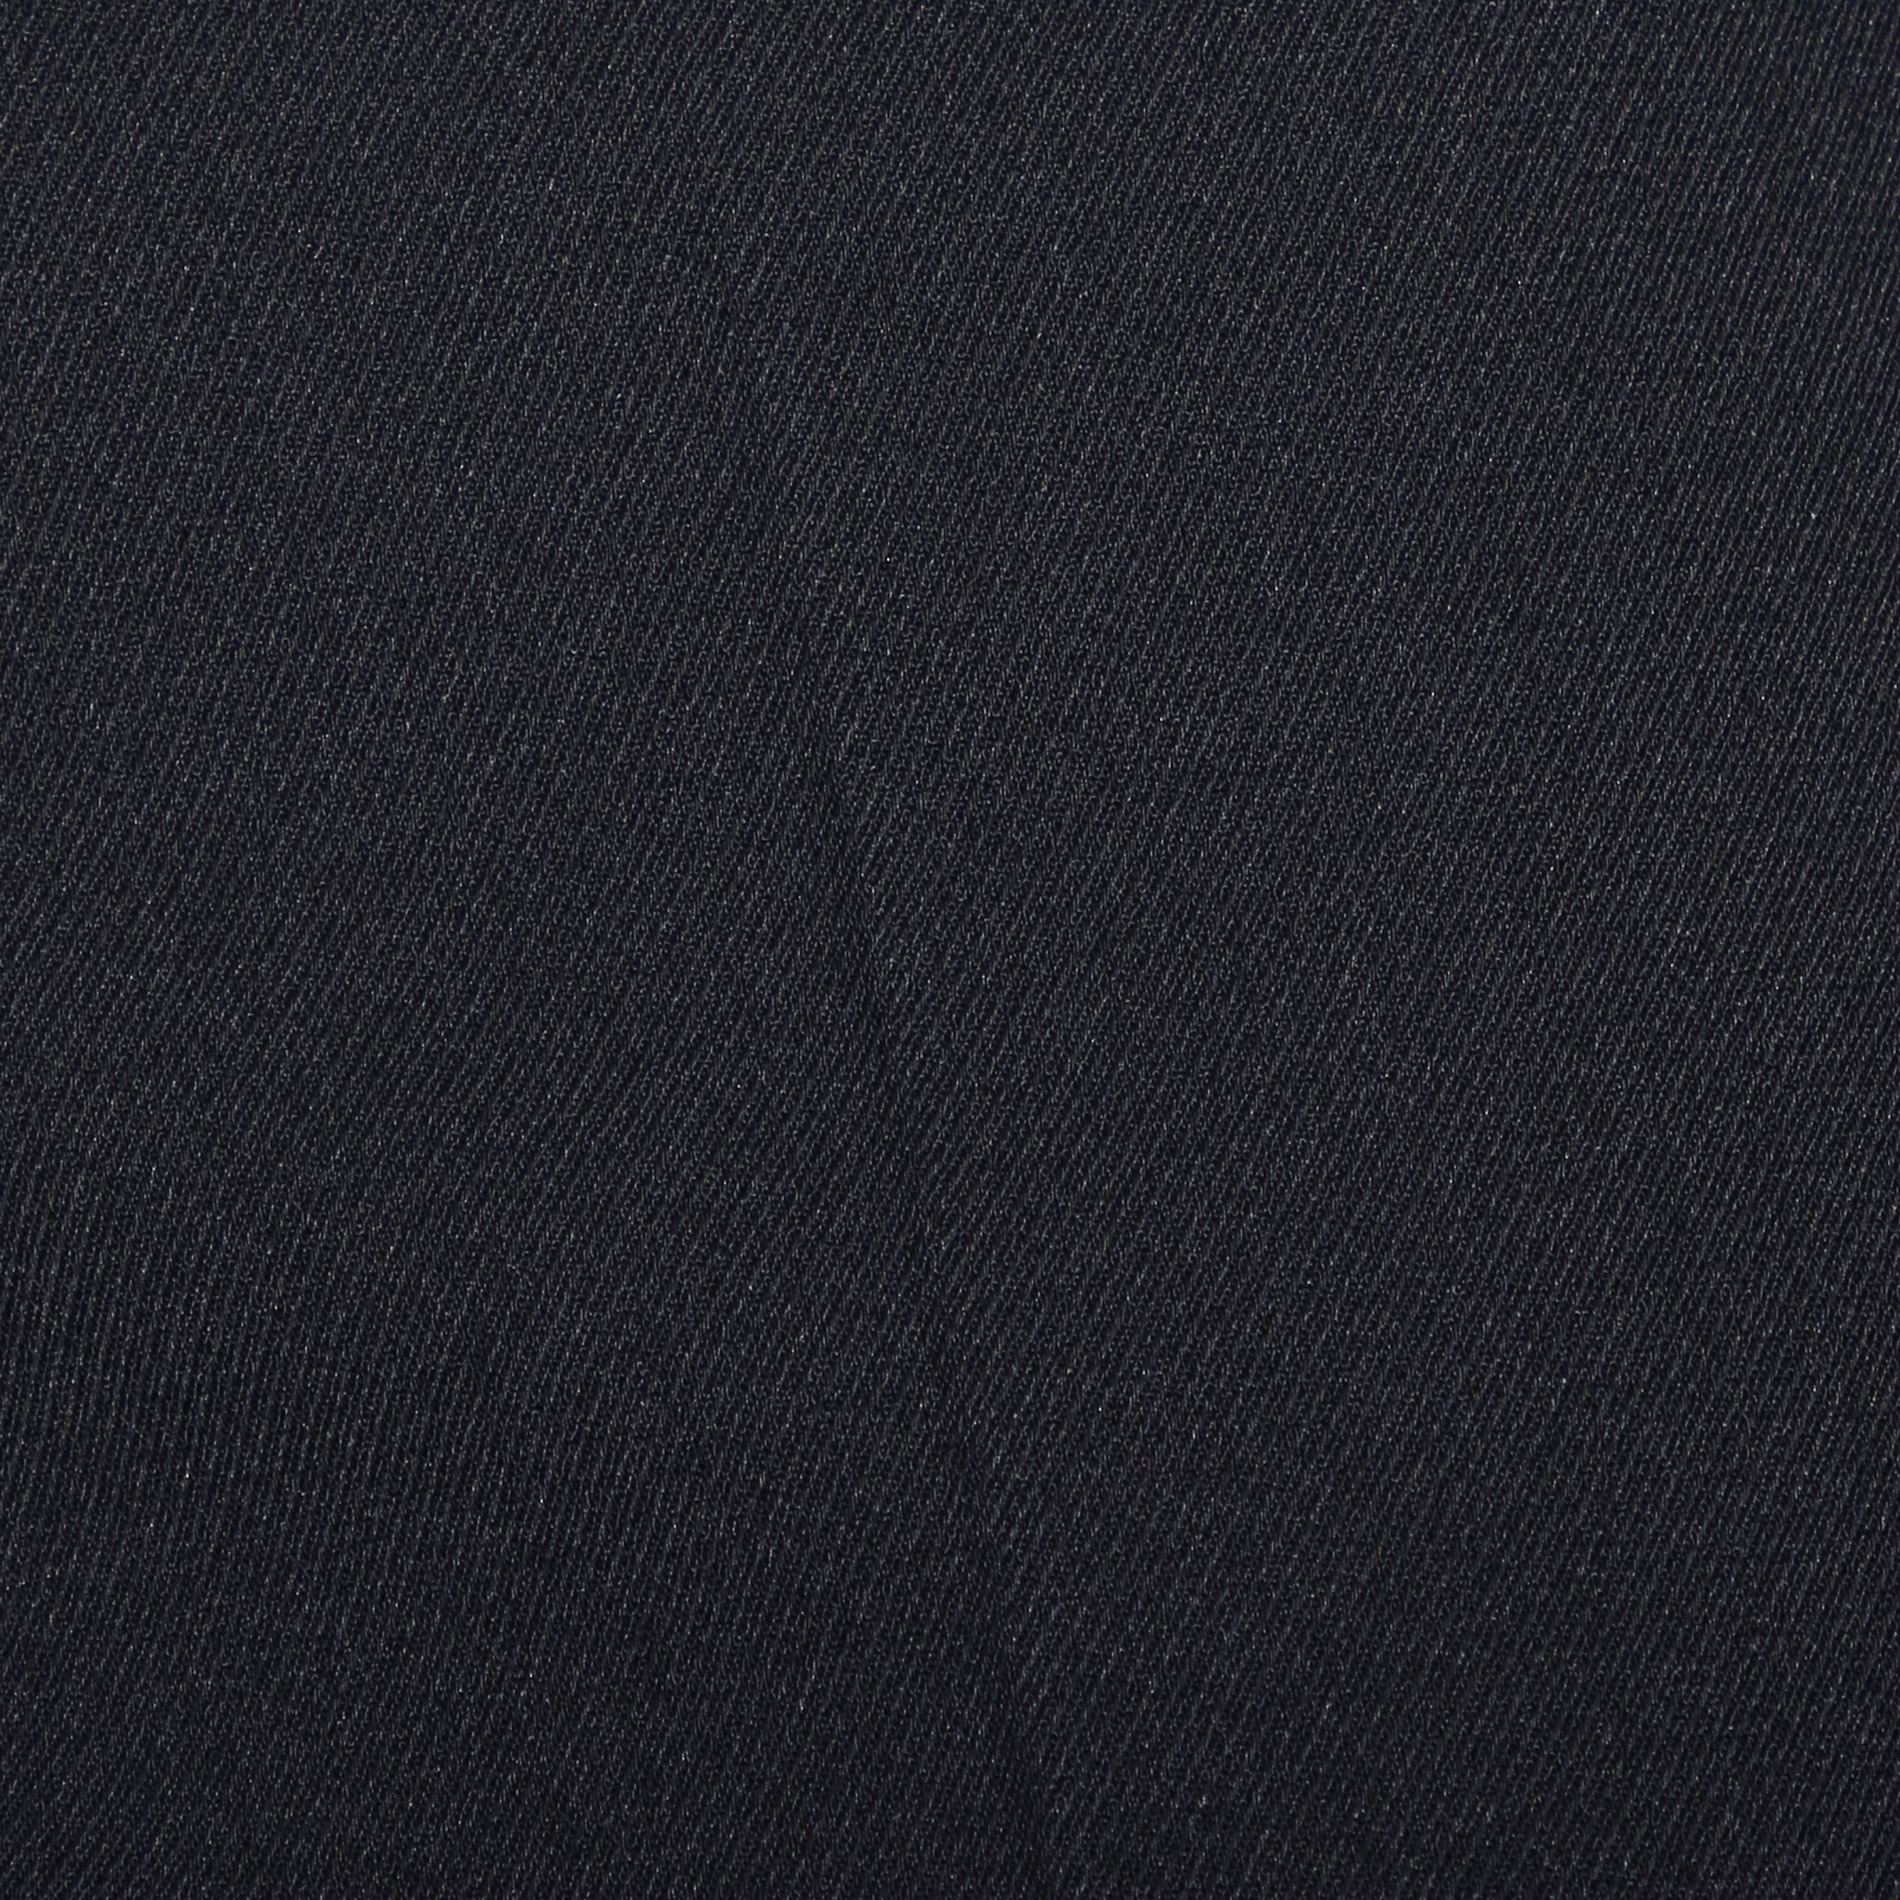 【Breasy Jacket】セットアップカルゼパンツ